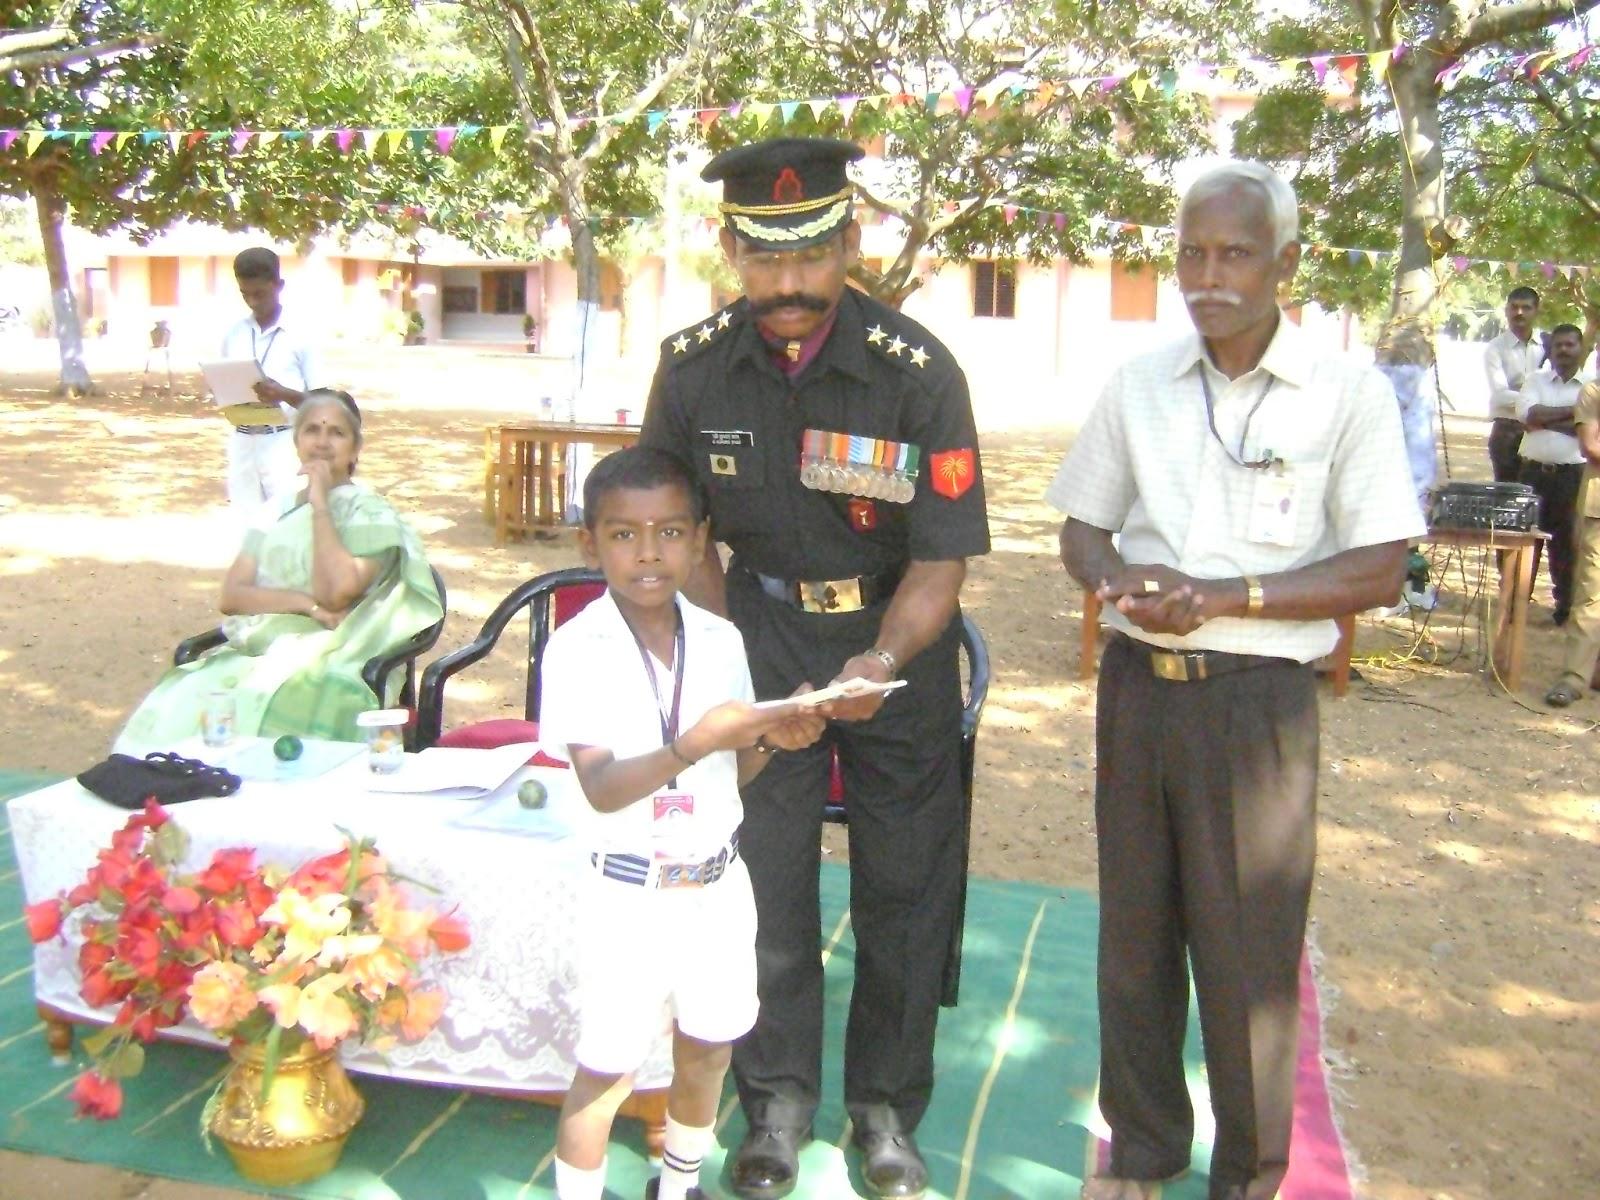 January 2019 - Vivekananda Kendra Vidyalaya Kanyakumari